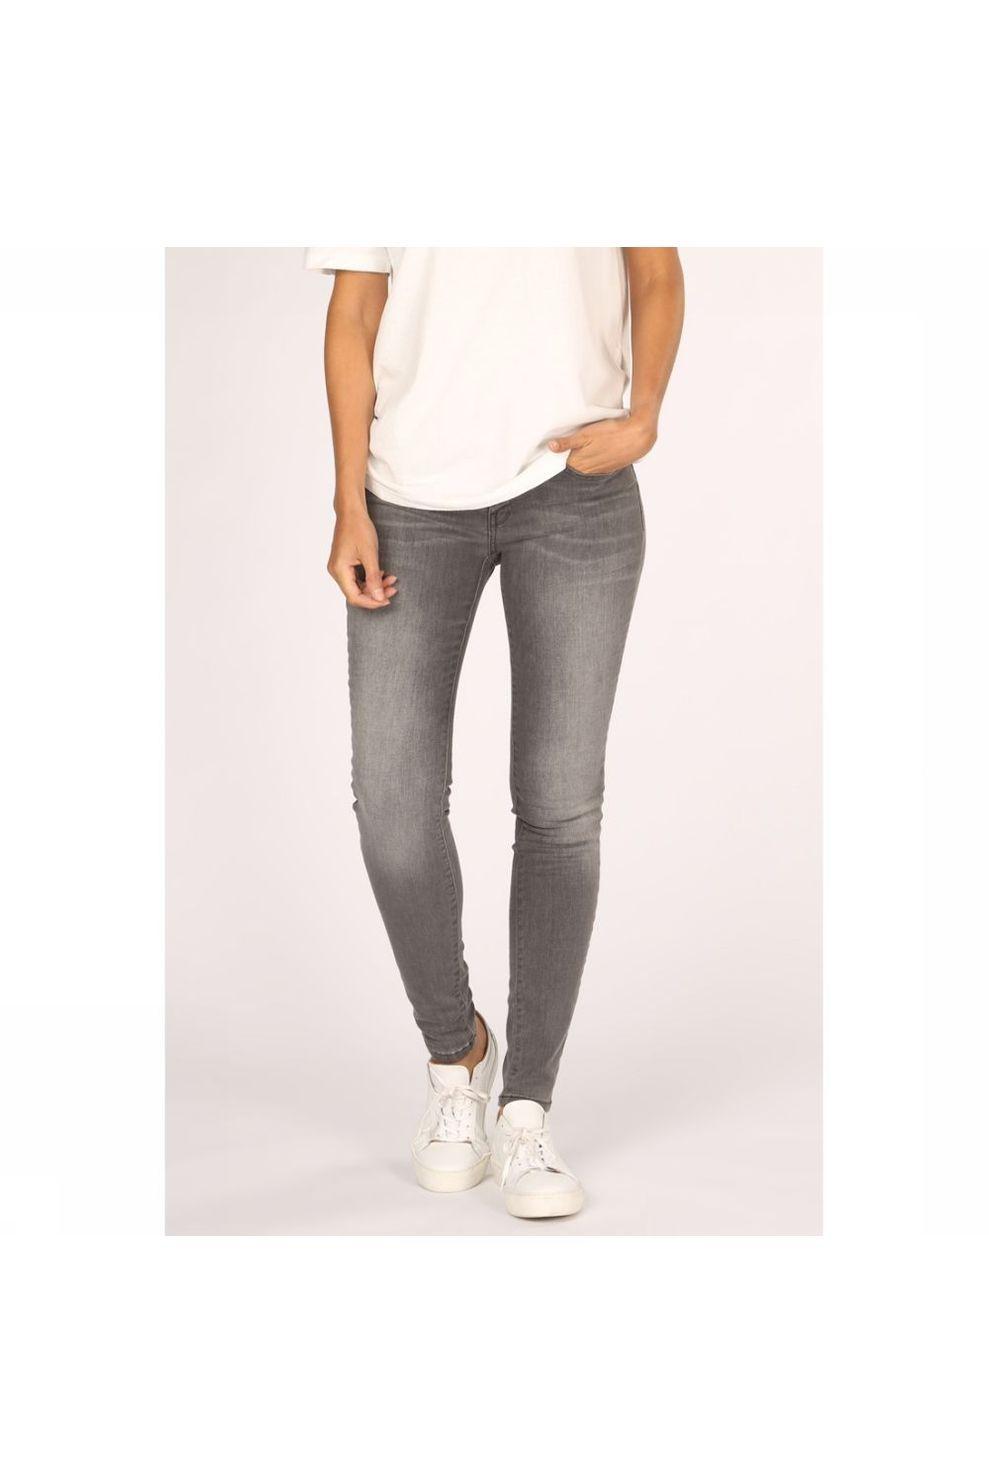 YAYA Jeans Basic Skinny 5-Pocket With Stretch voor dames - Grijs - Maten: 34, 36, 38, 40, 42, 44